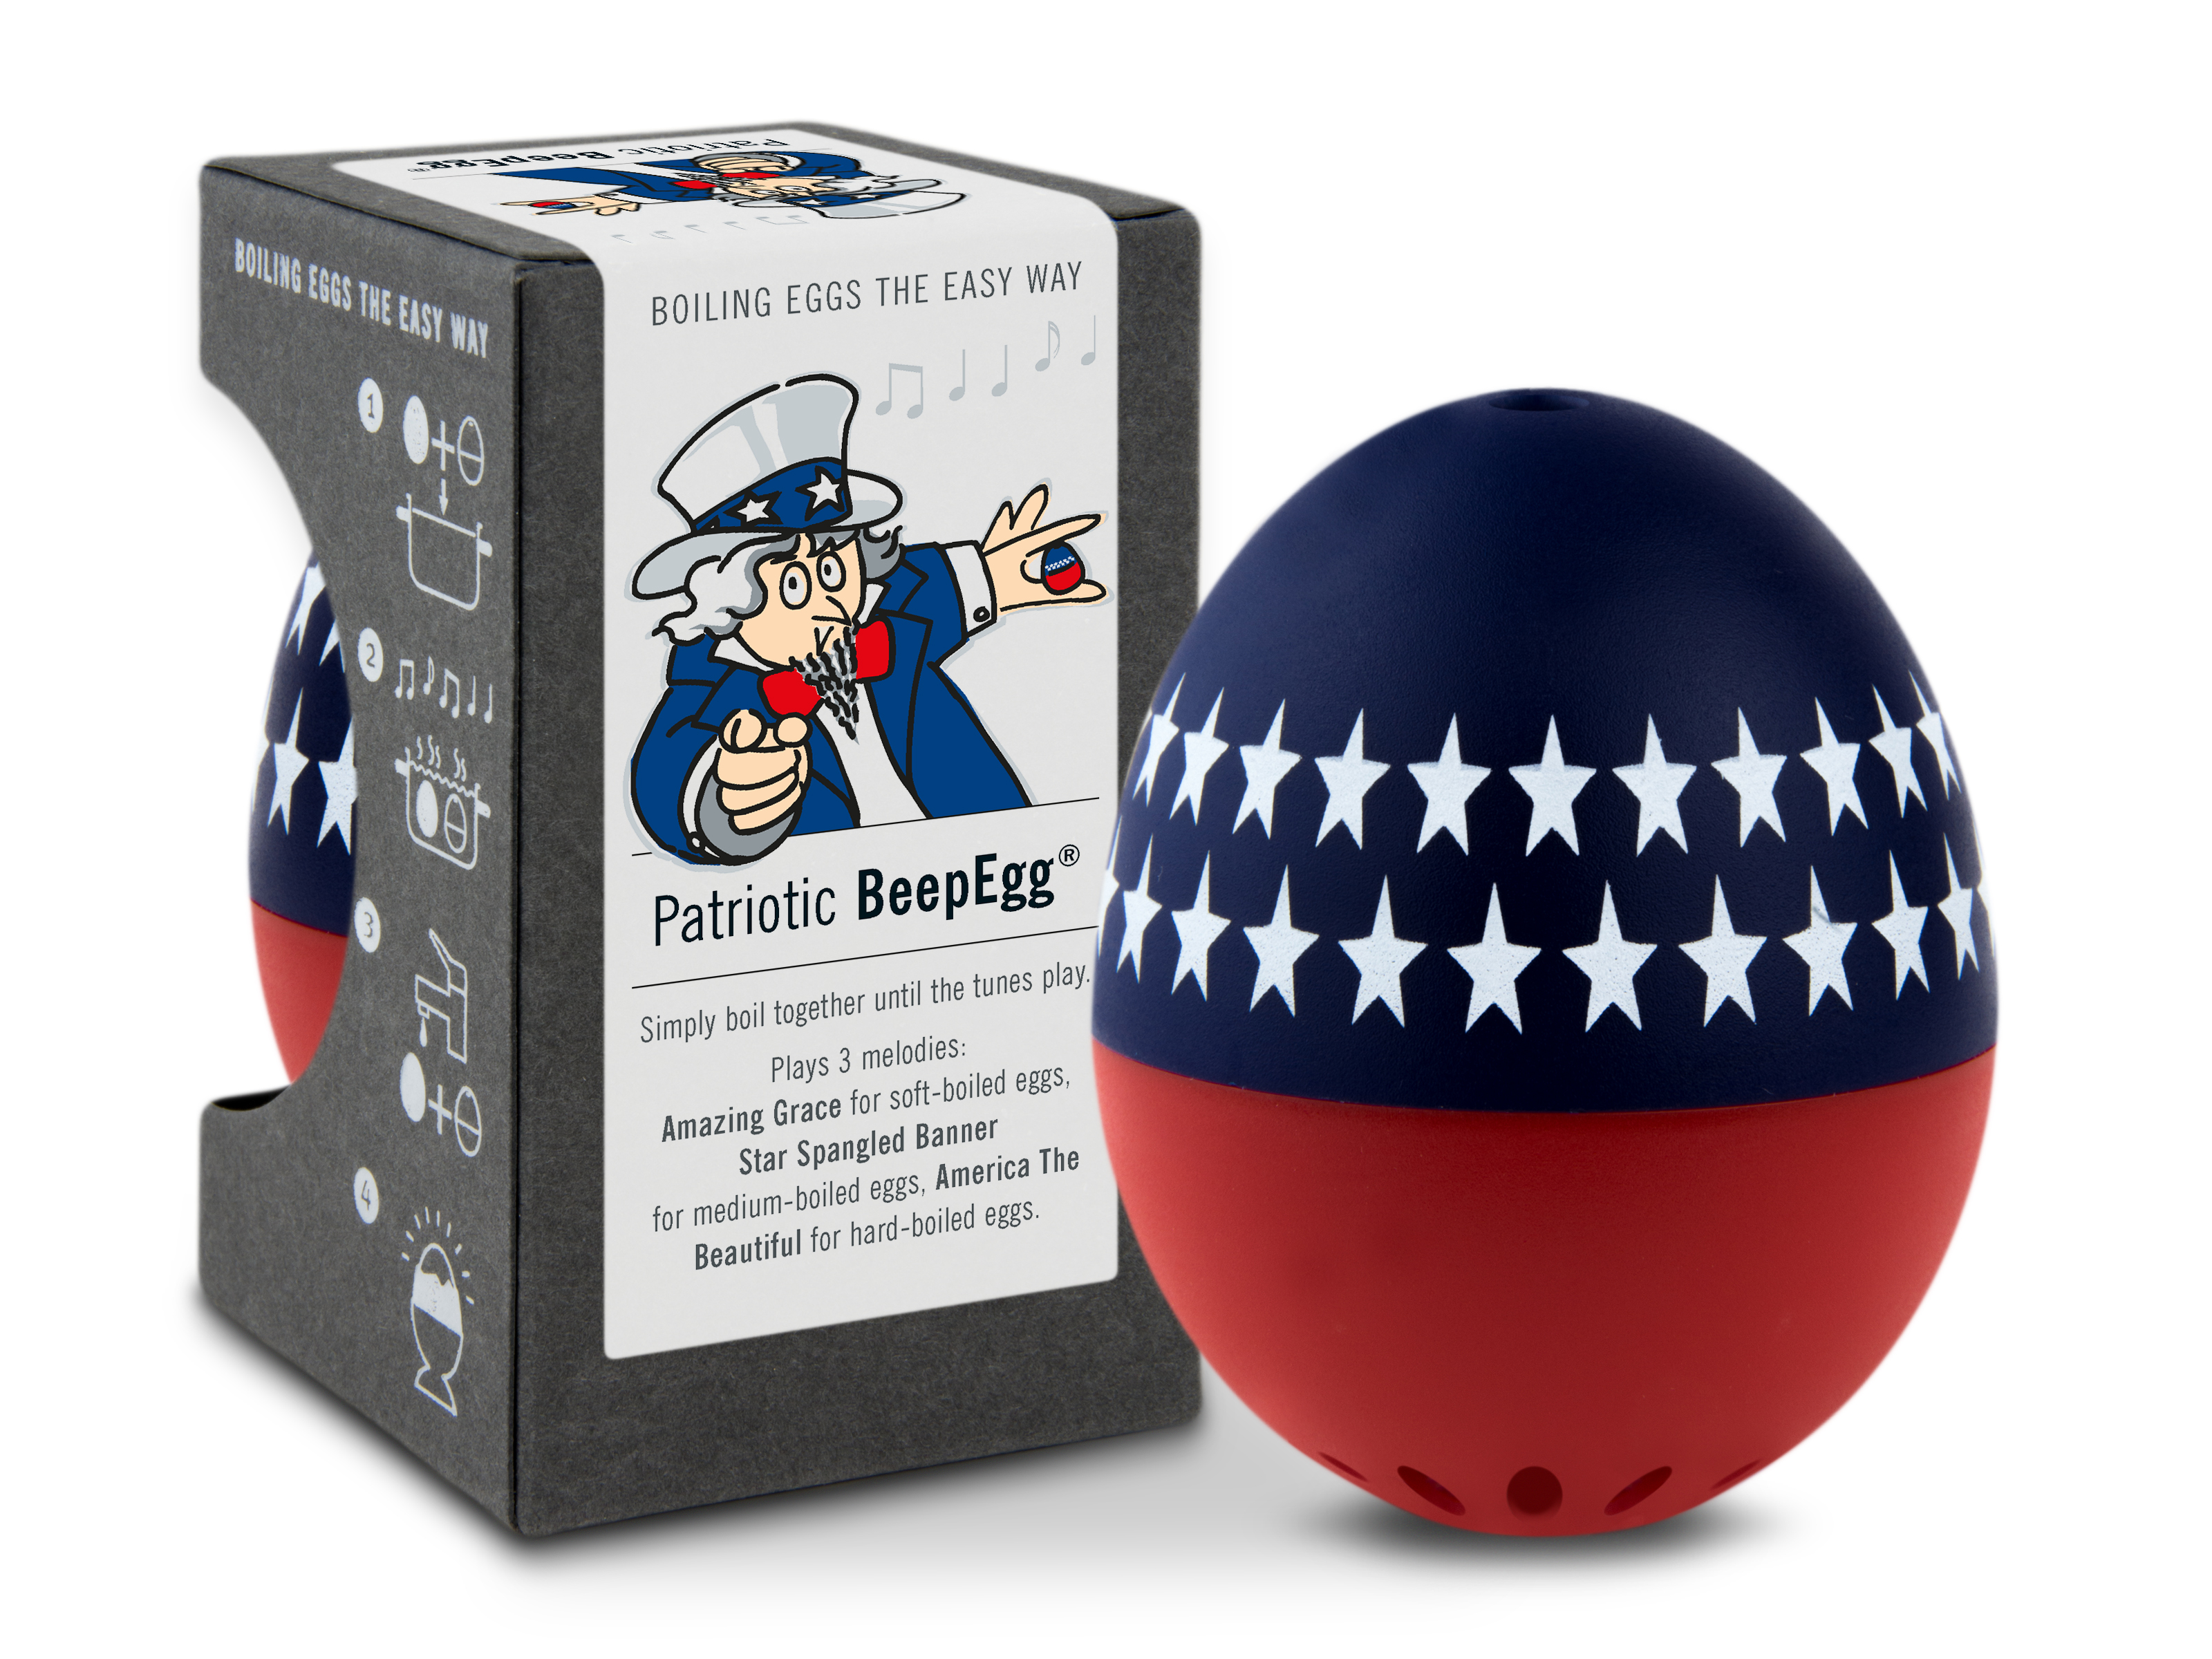 BeepEgg A004526 Basic Singing & Floating Egg Timer, Patriotic